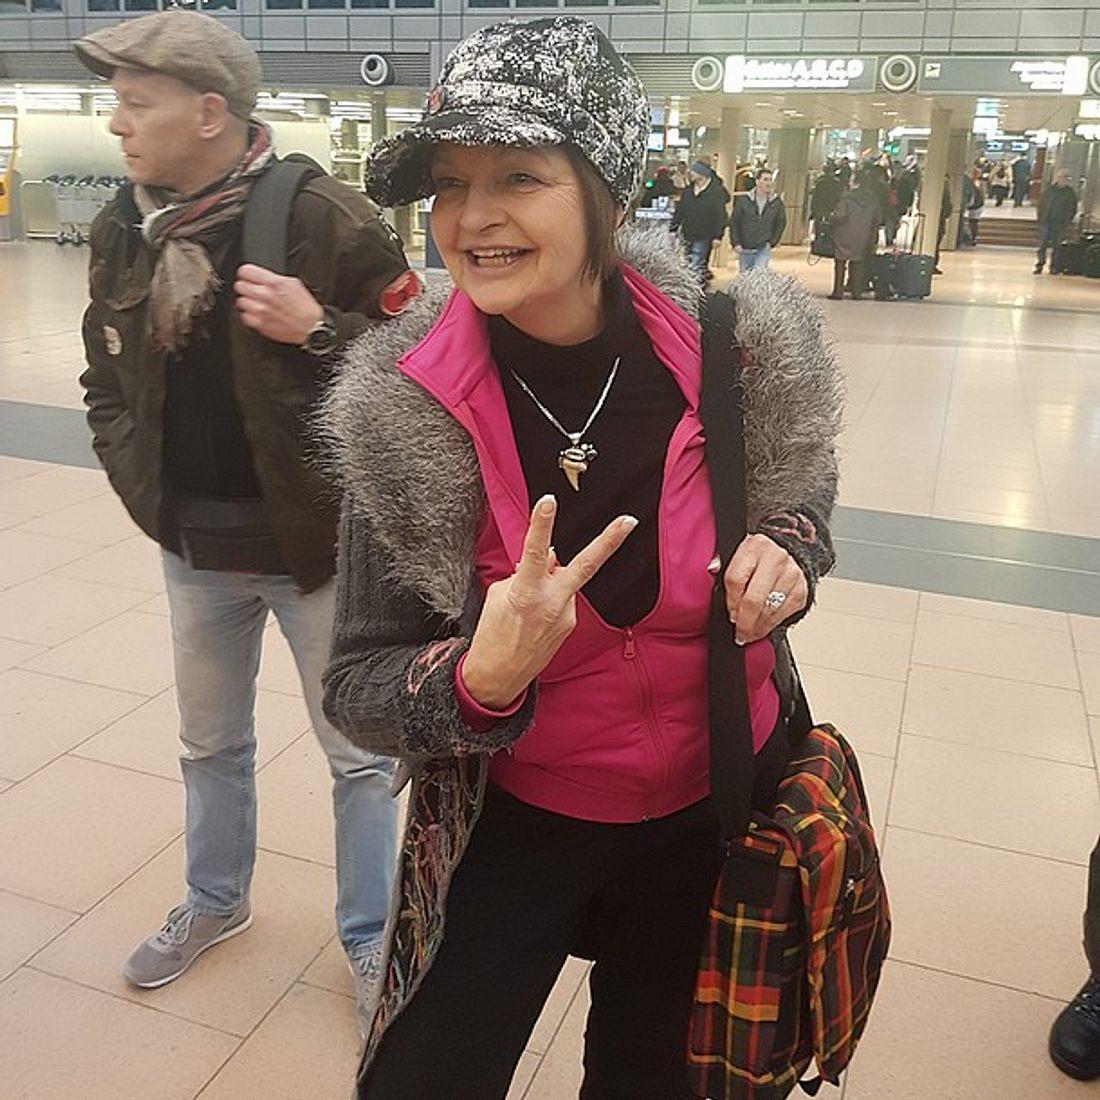 Dschungelcamp 2017: Frl. Menke am Flughafen